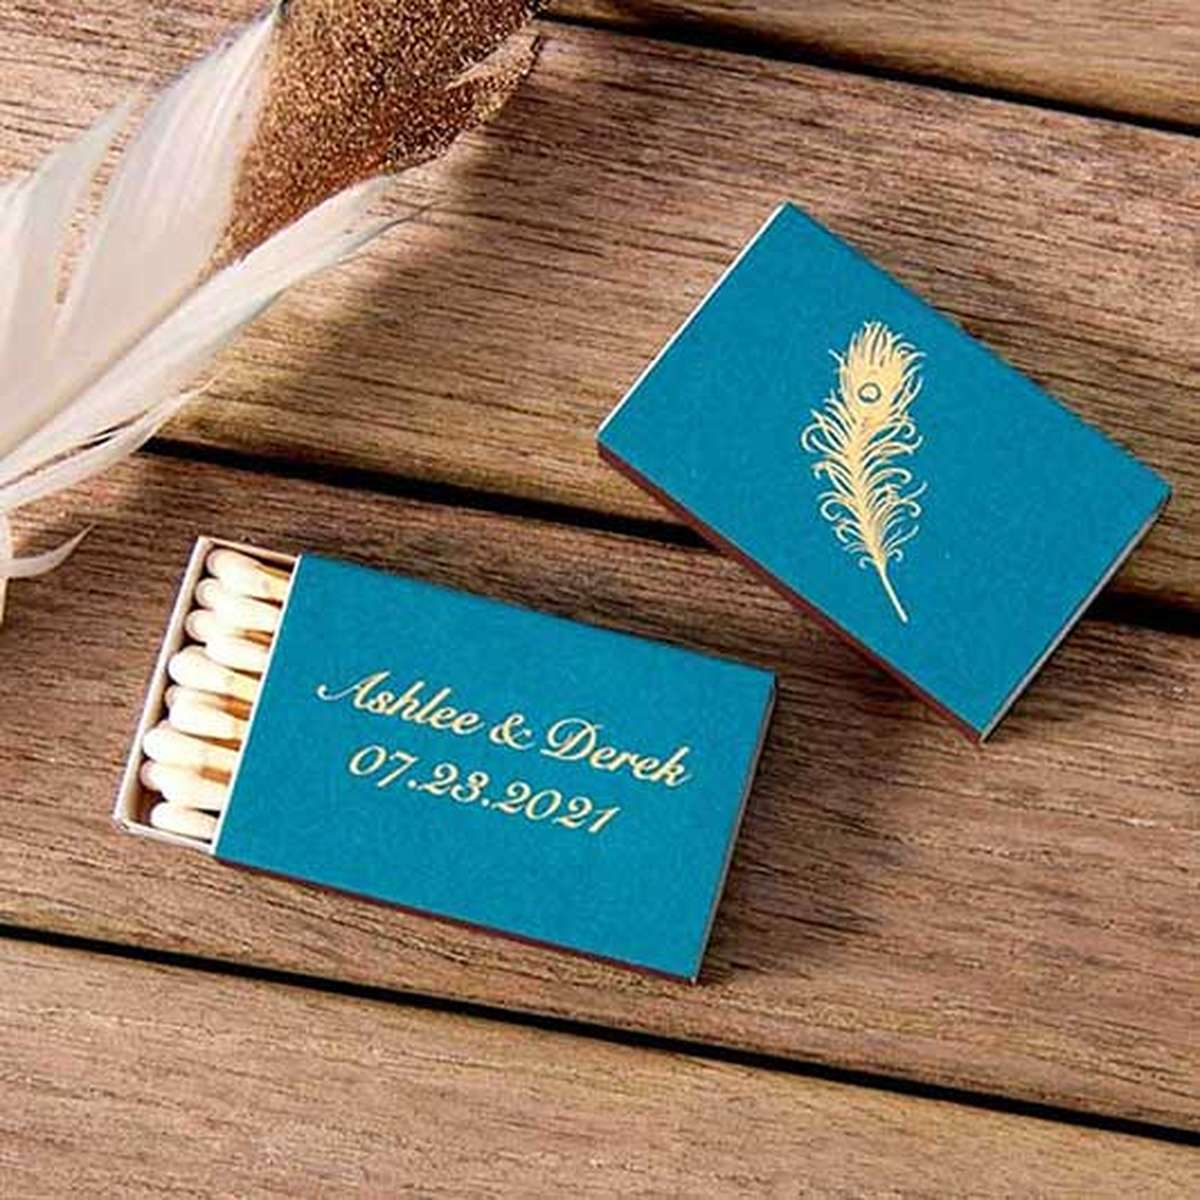 Matches Custom Matchbooks & Wedding Party